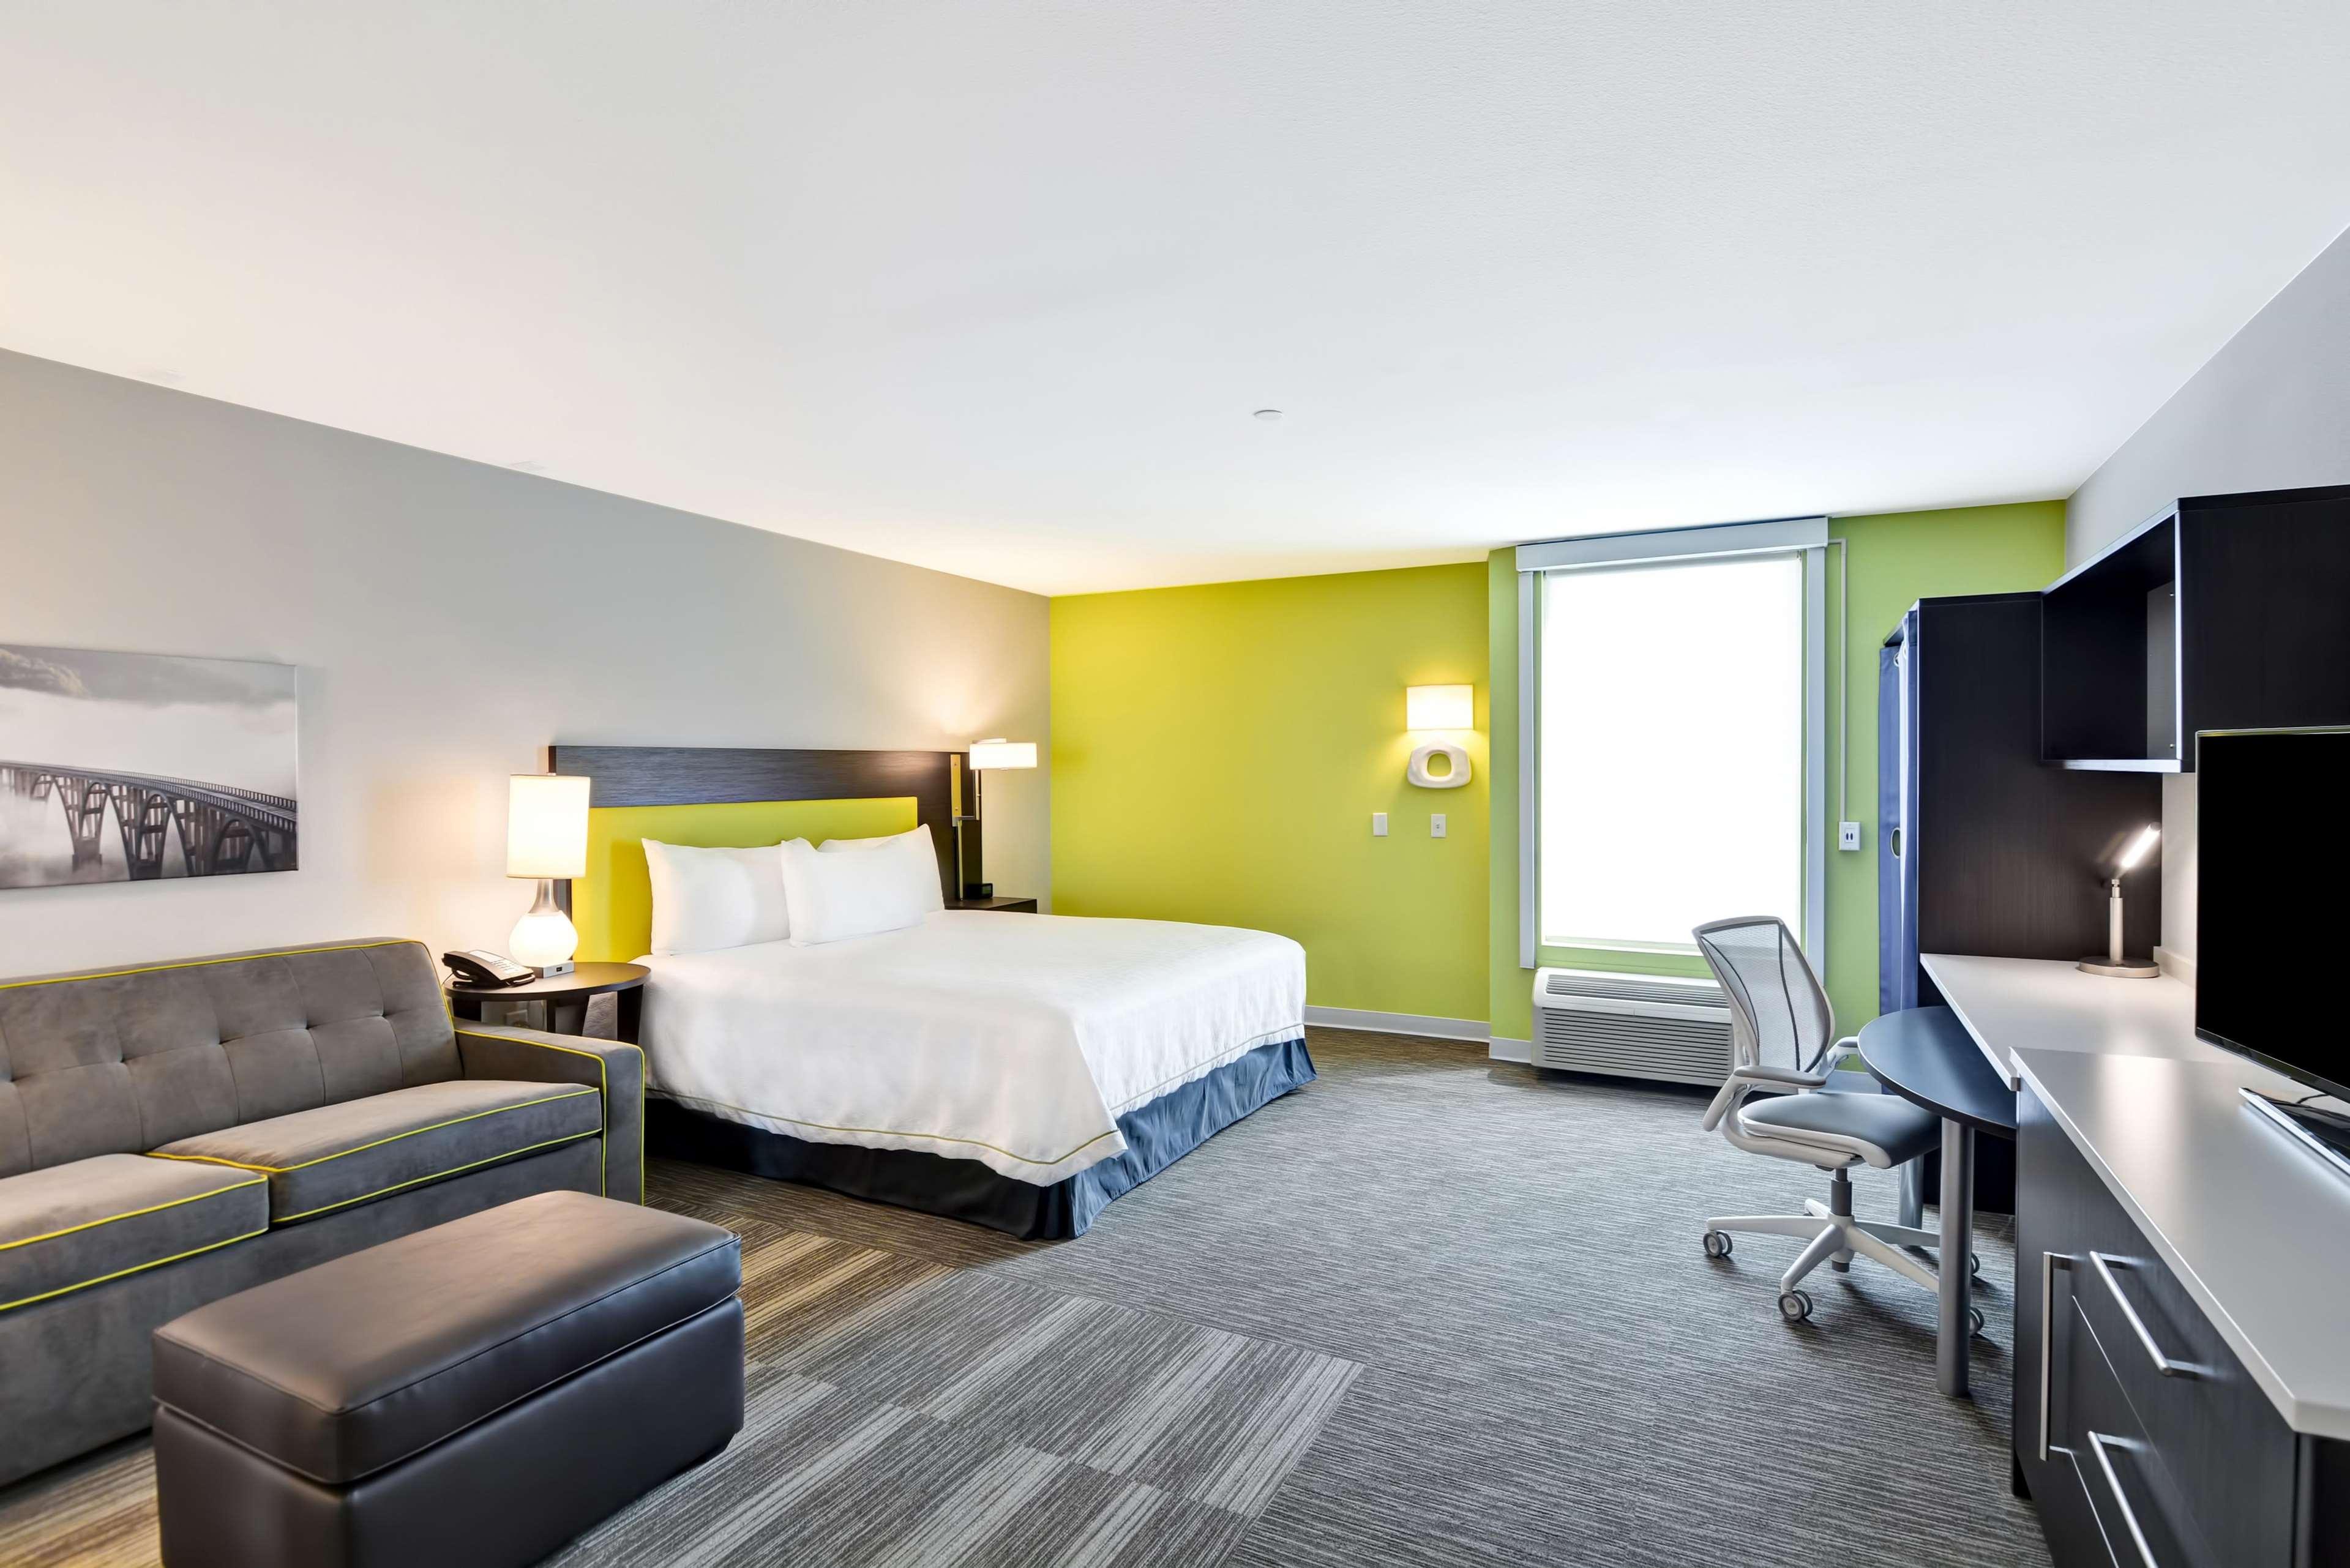 Home2 Suites by Hilton Azusa image 11